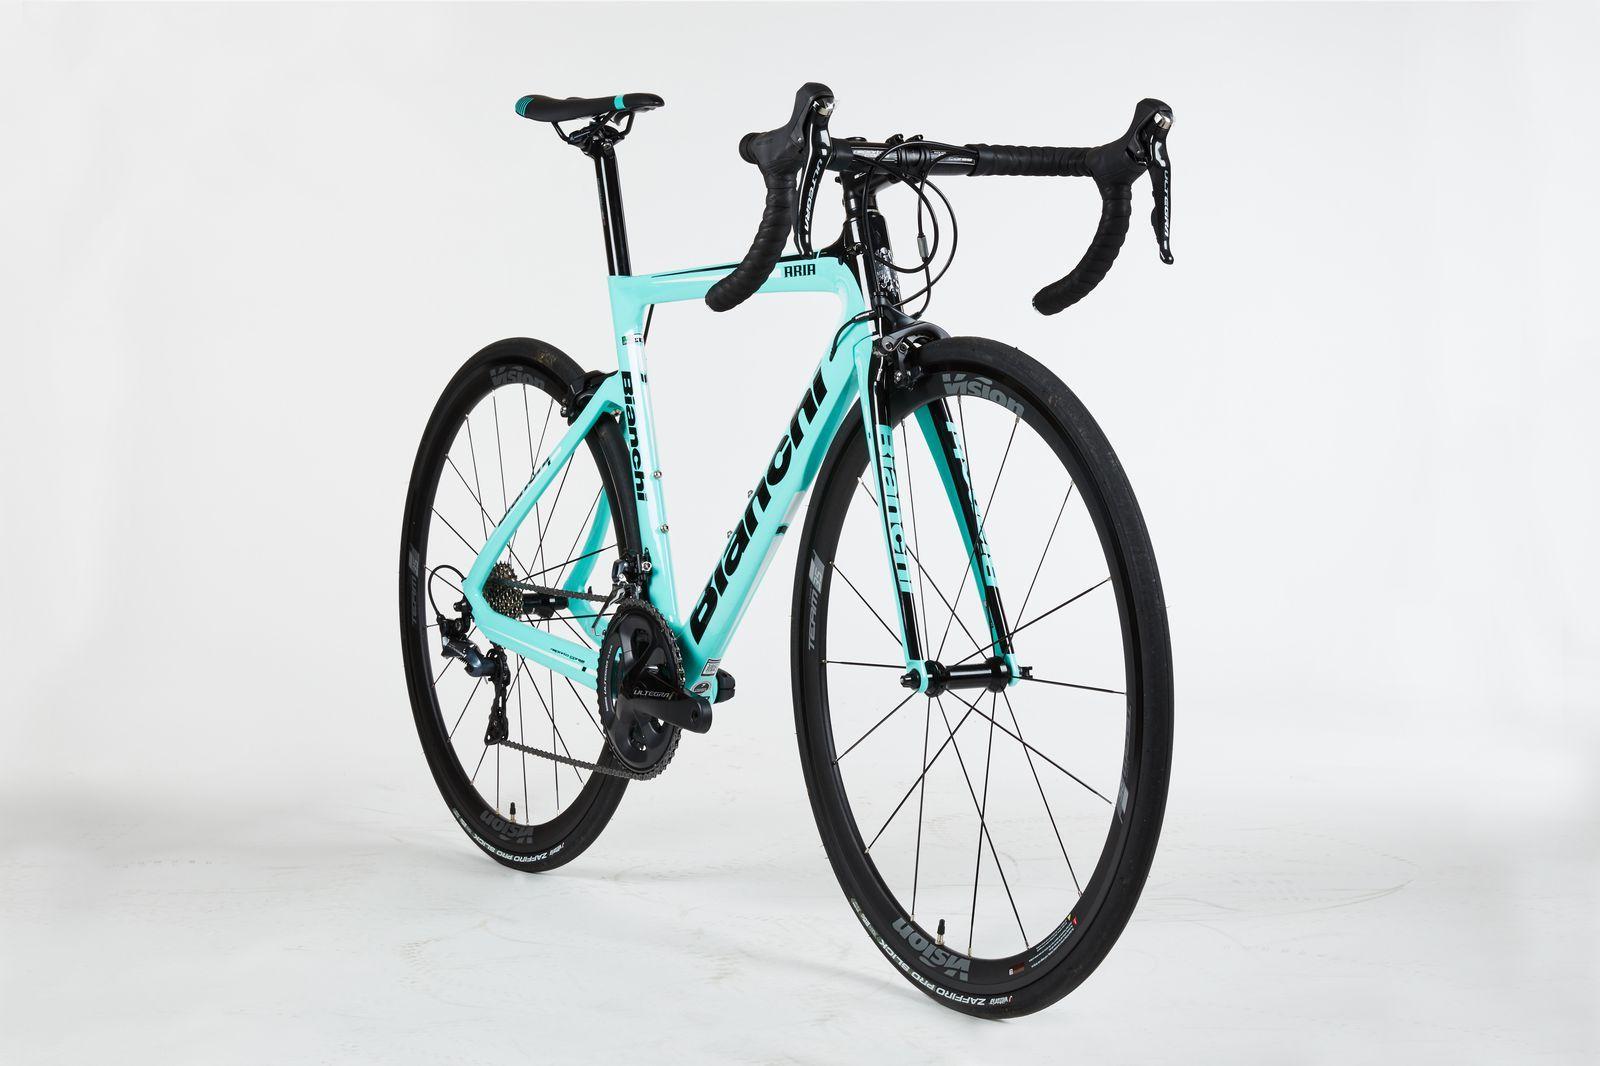 Bianchi Aria Ultegra Gallery Bike Seat Road Bike Gear Bike